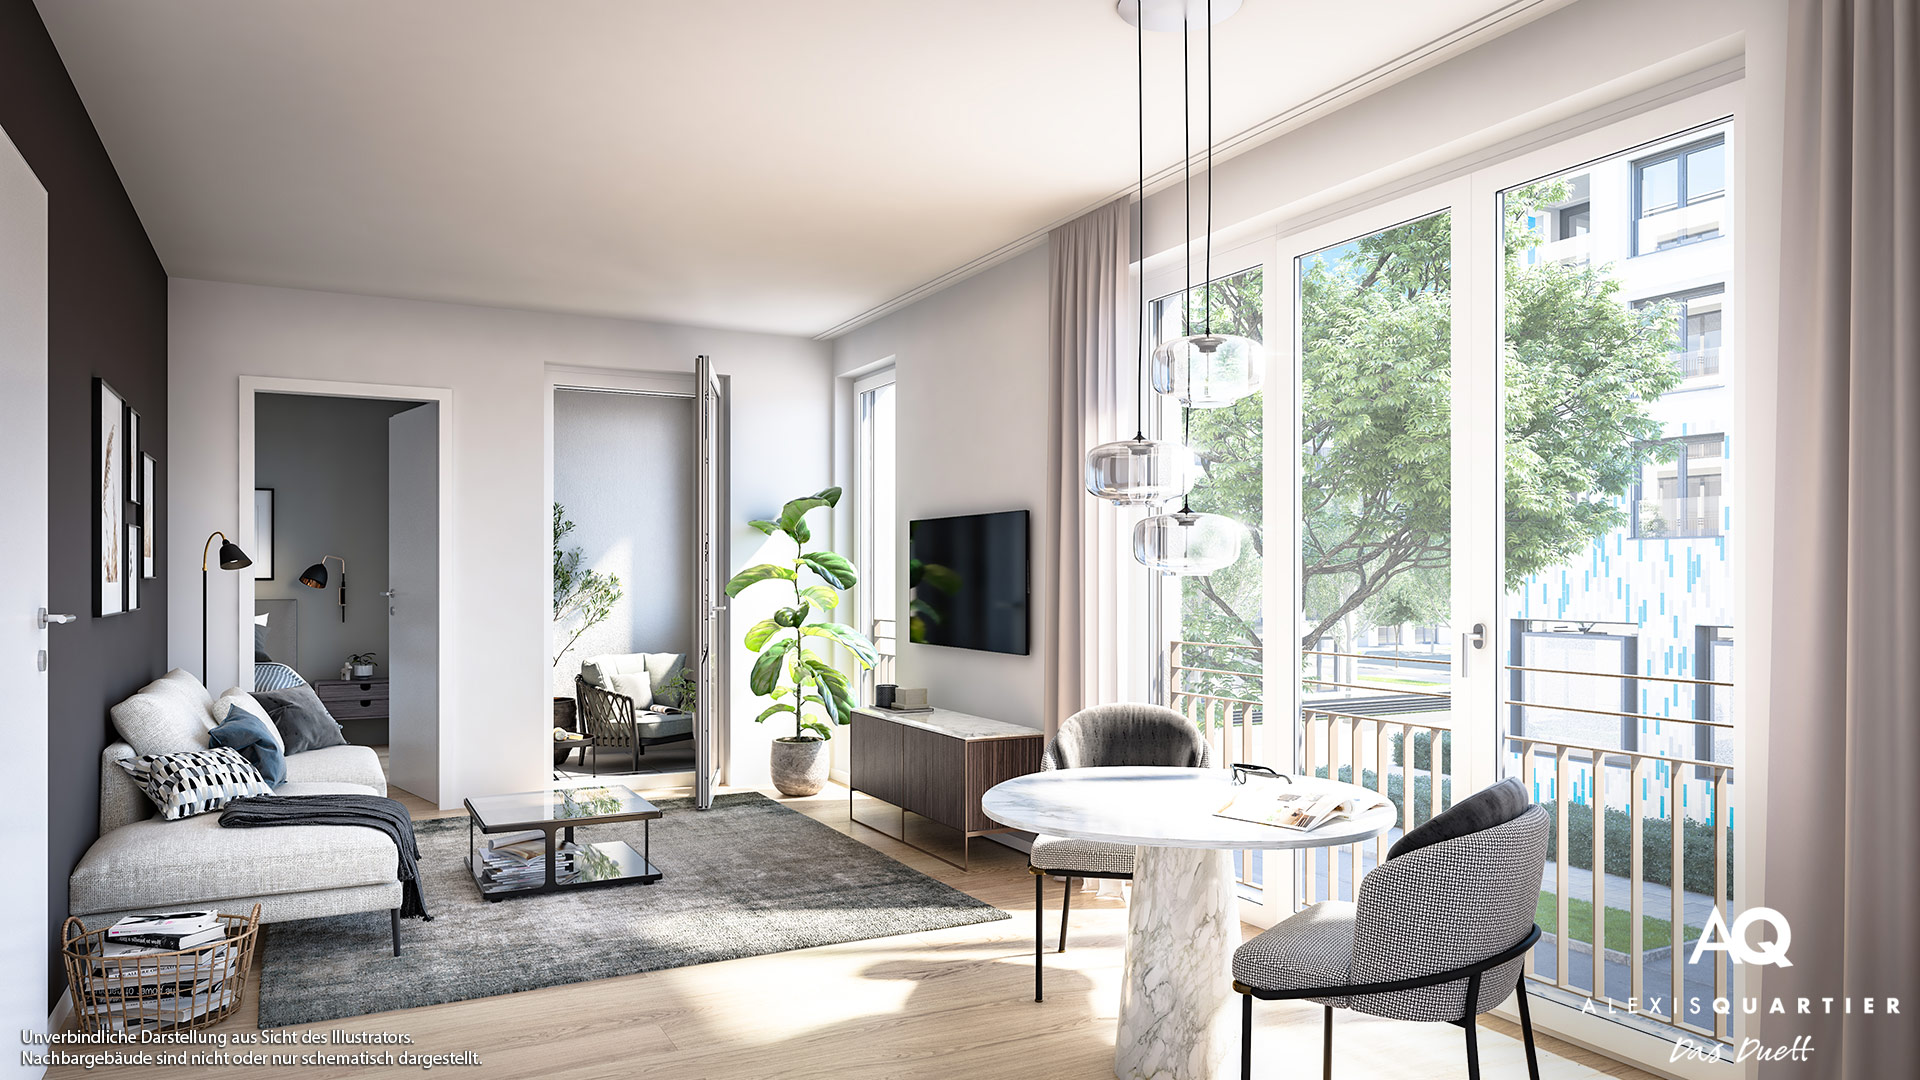 Immobilie Alexisquartier - Das Duett - Illustration 8